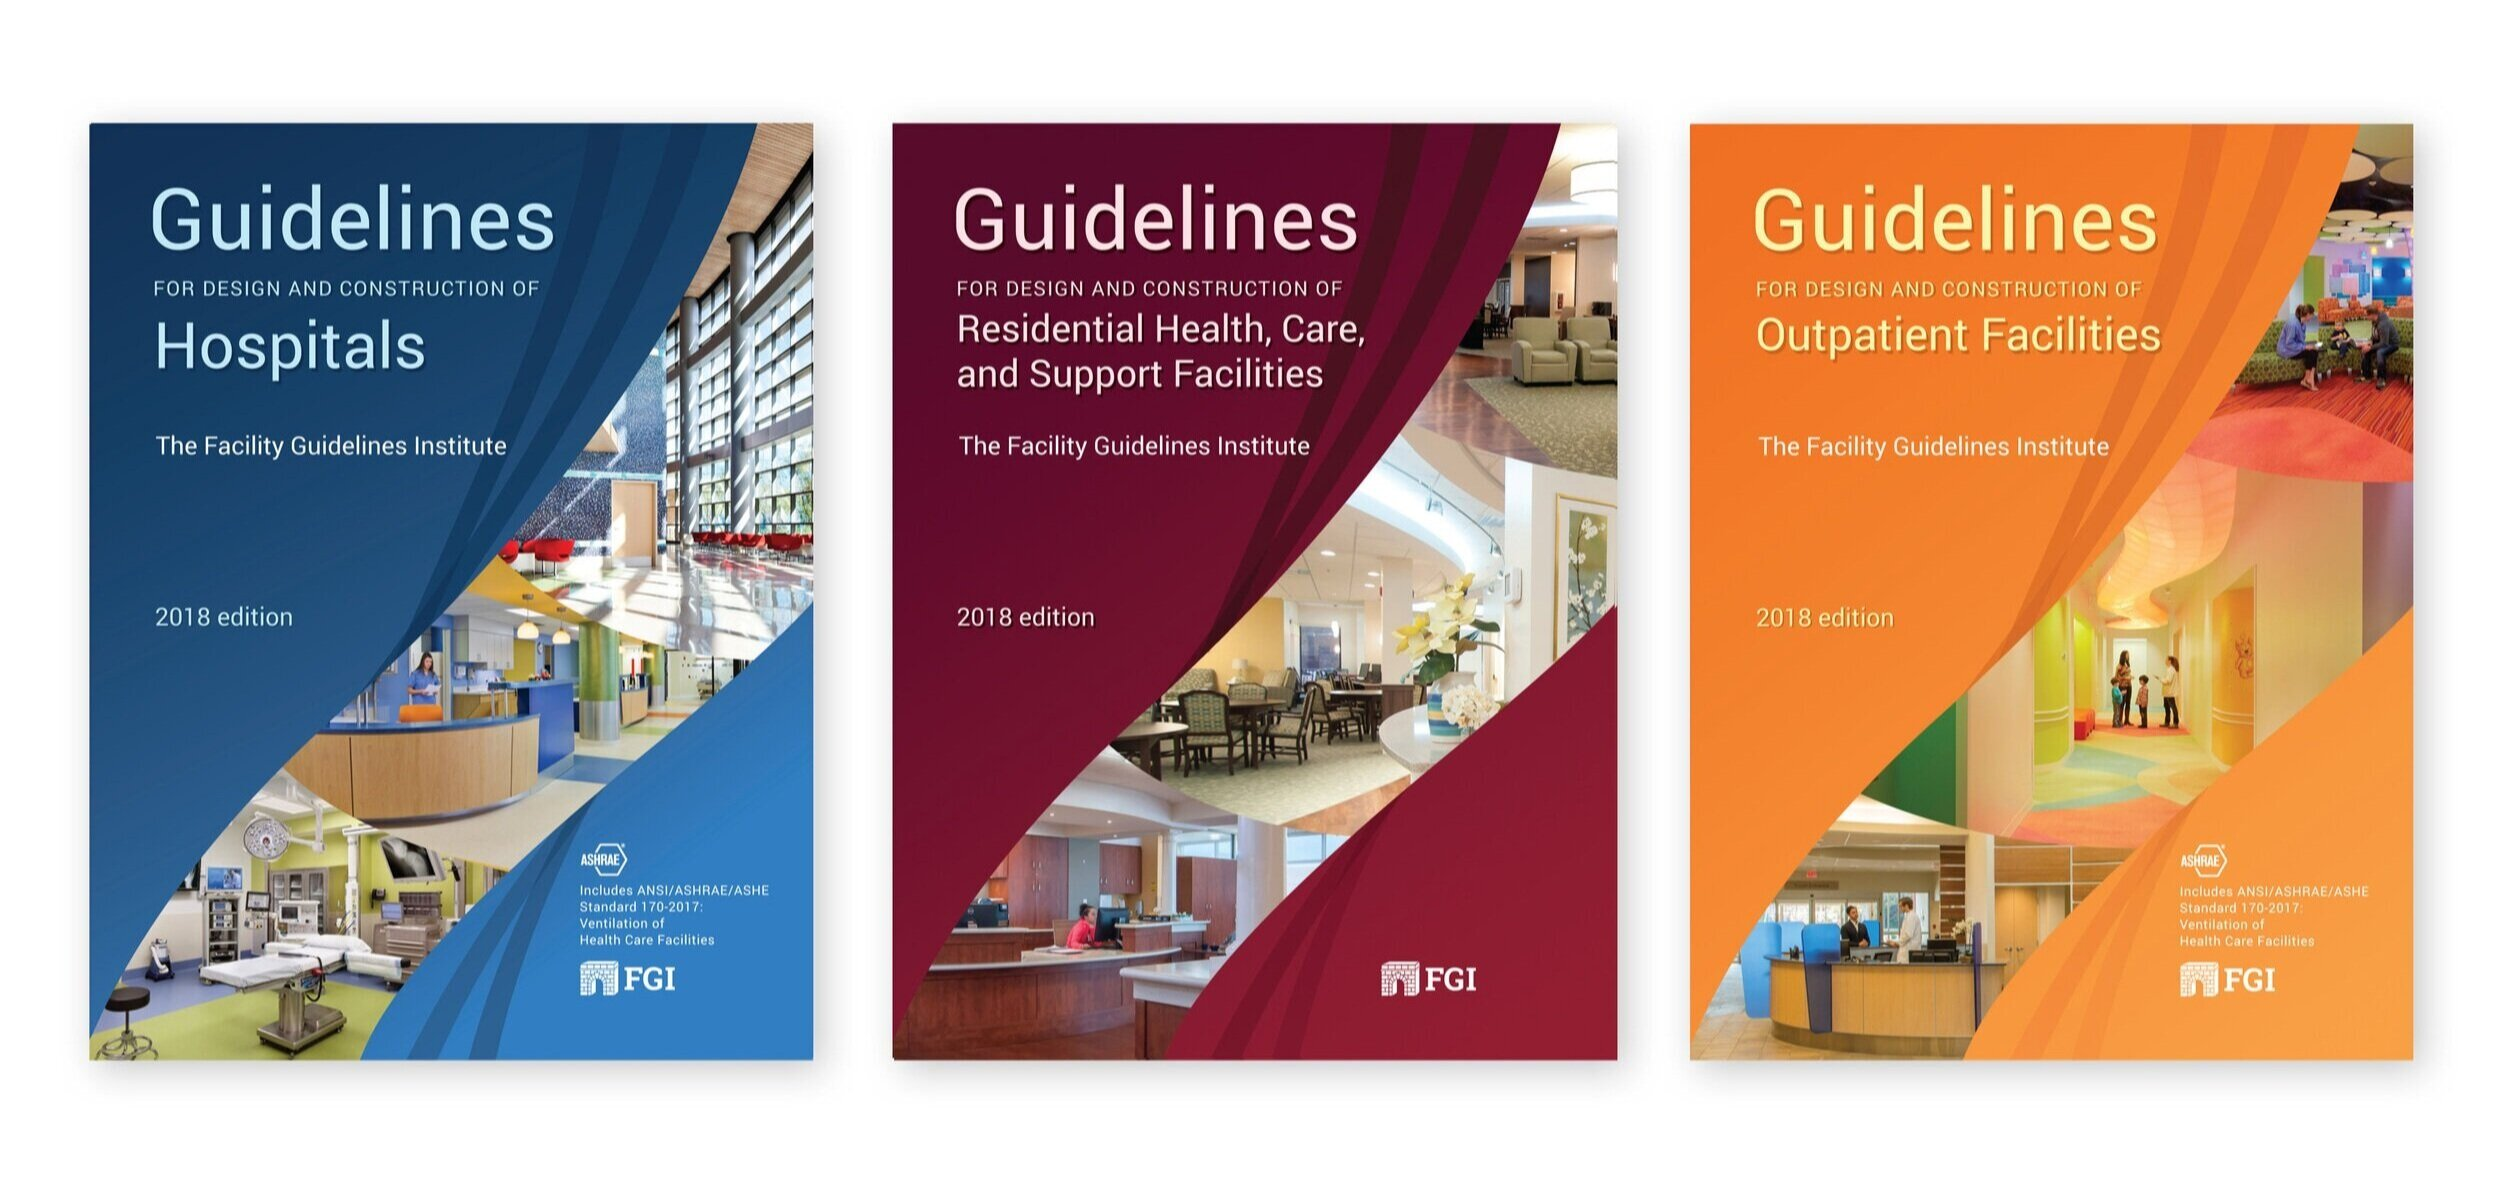 Guidelines-group-image-2018.jpg